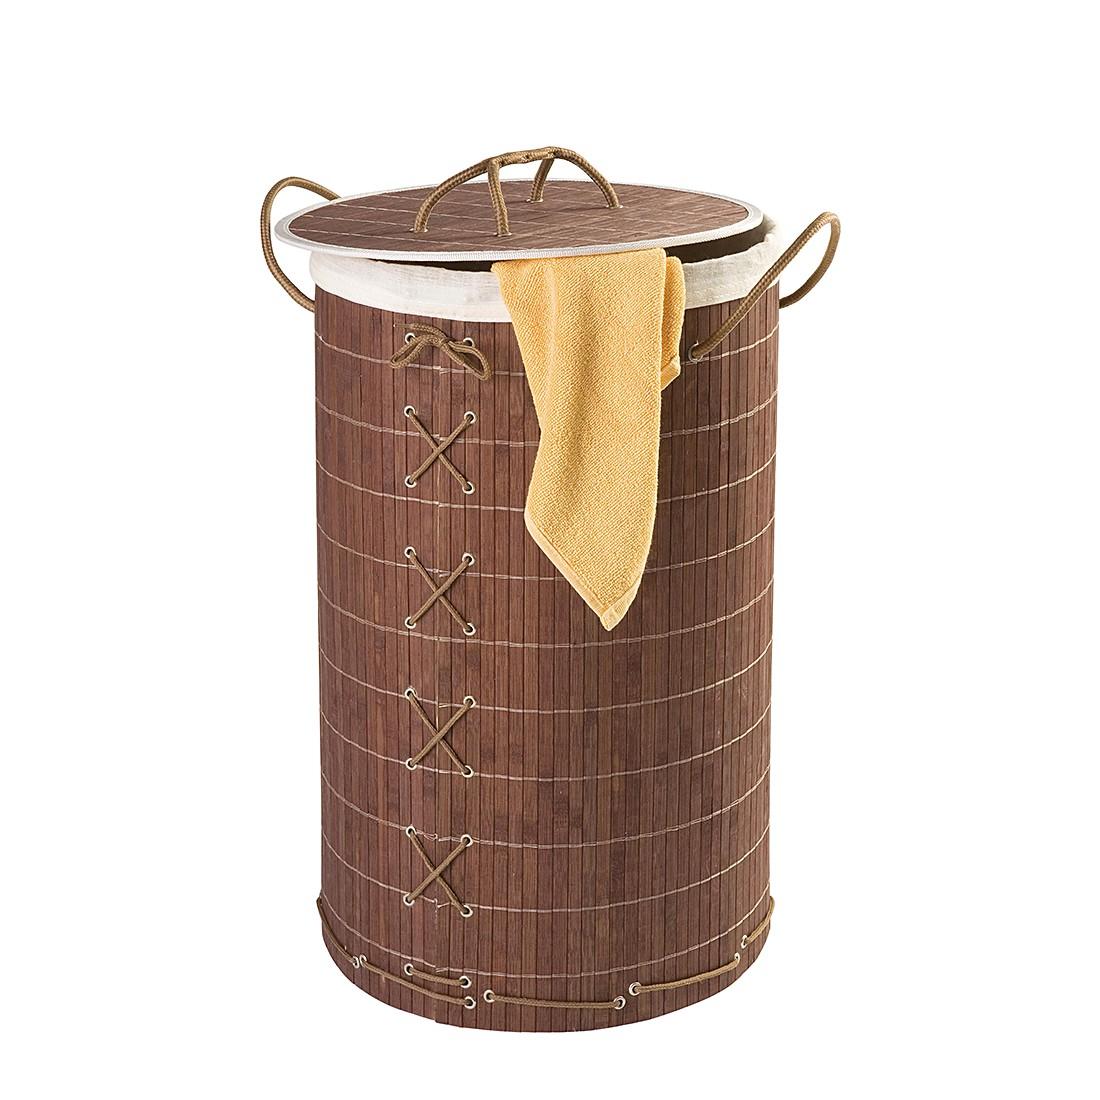 Wäschetruhe Bamboo, WENKO